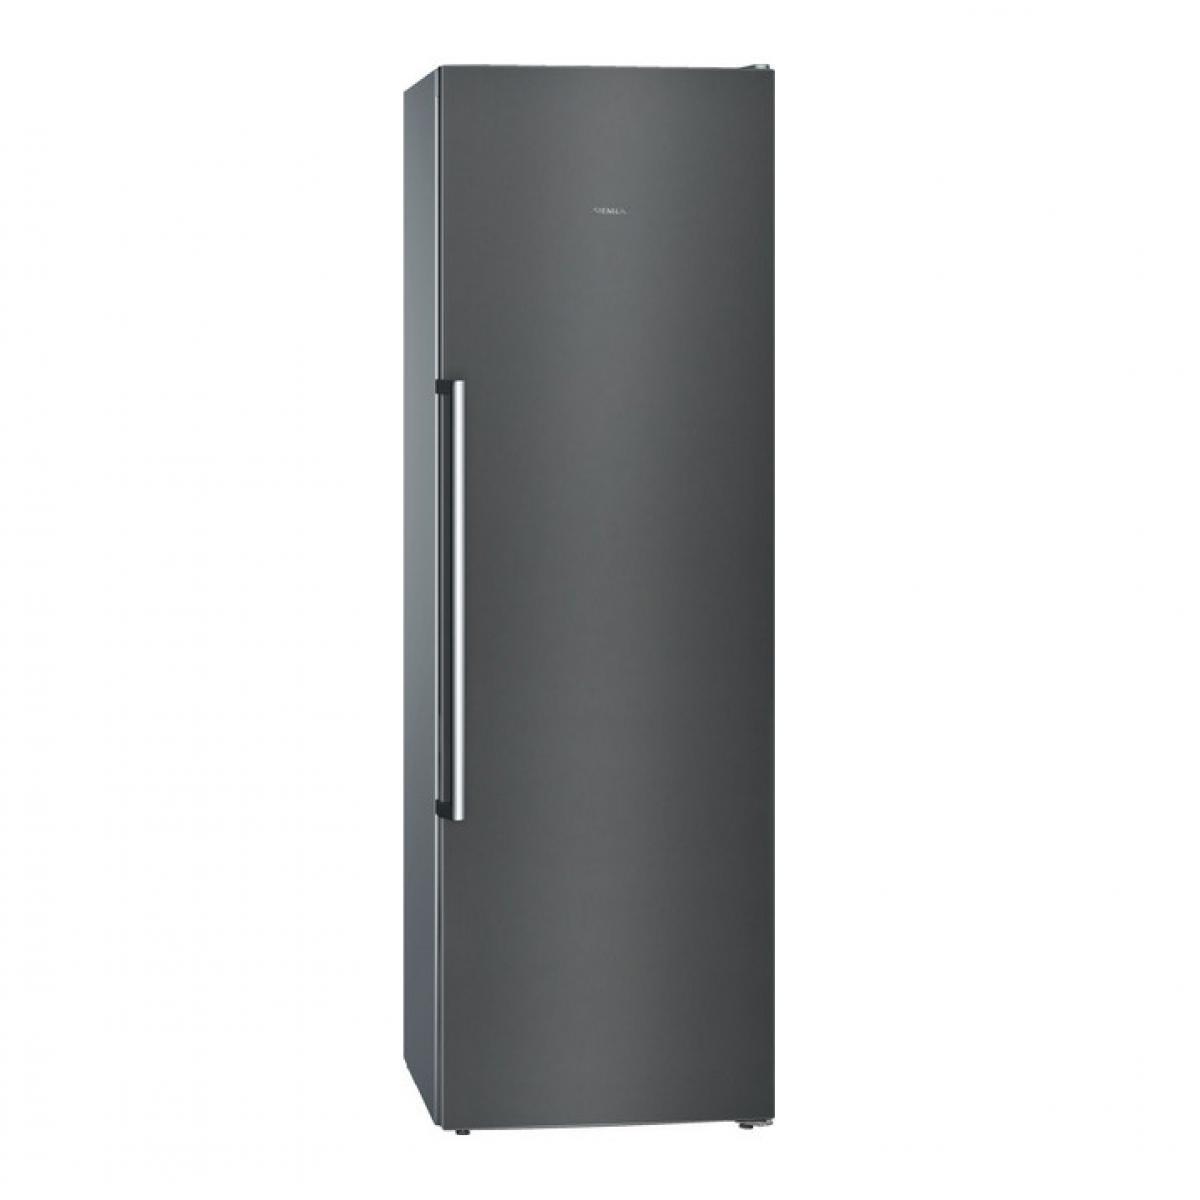 Siemens Congélateur armoire SIEMENS, GS36NAXEP